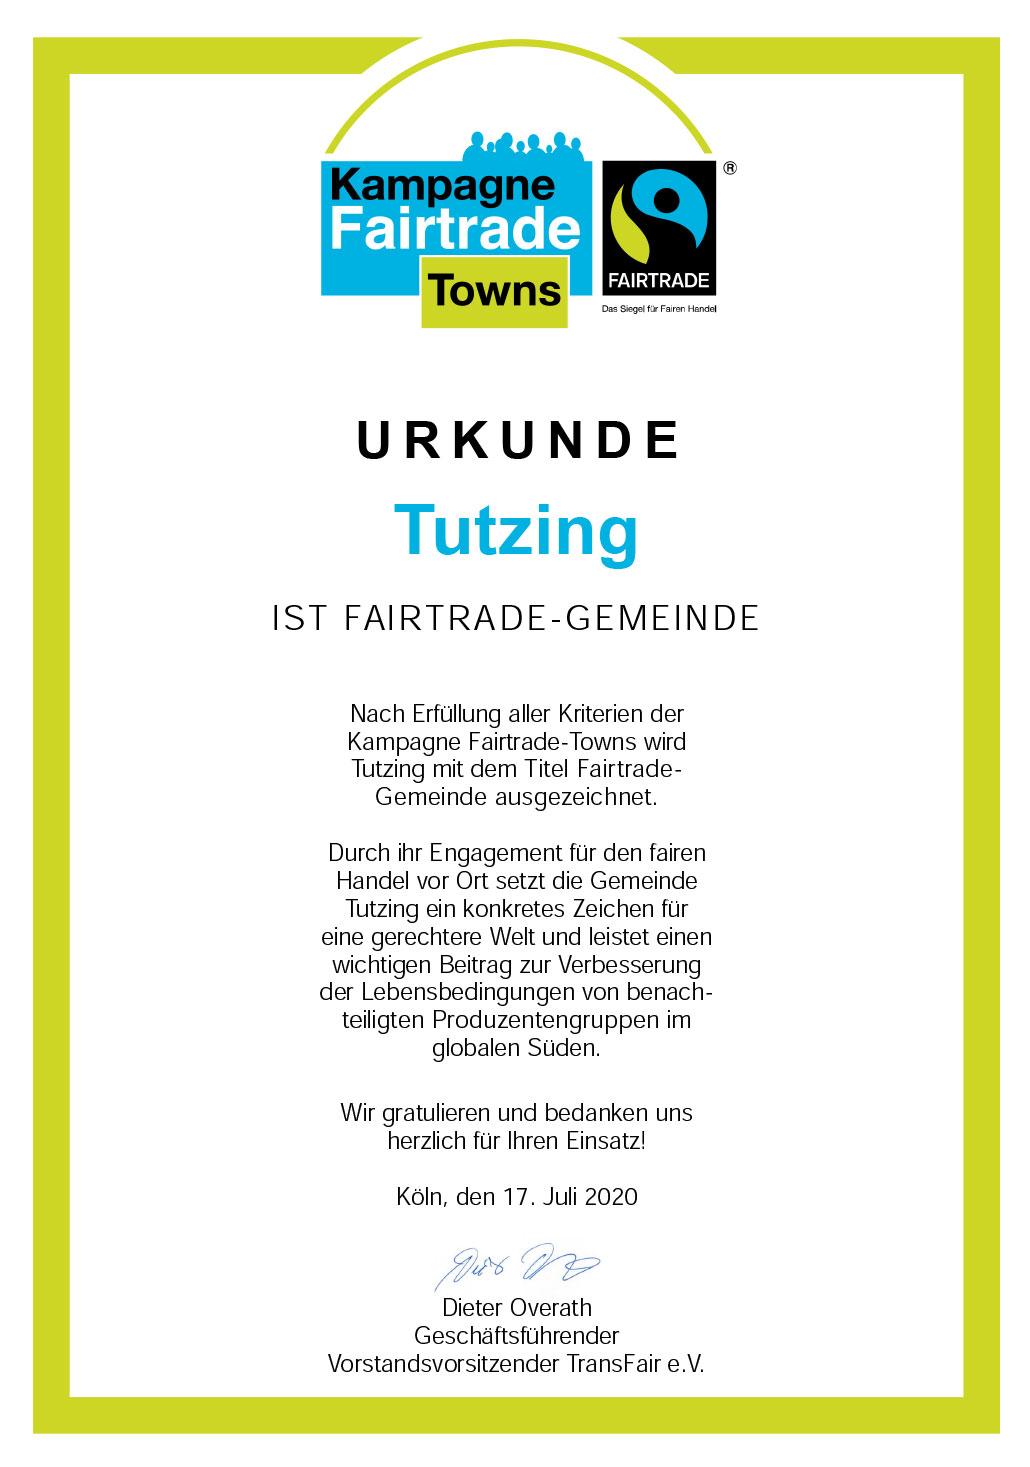 Fairtrade Urkunde Tutzing